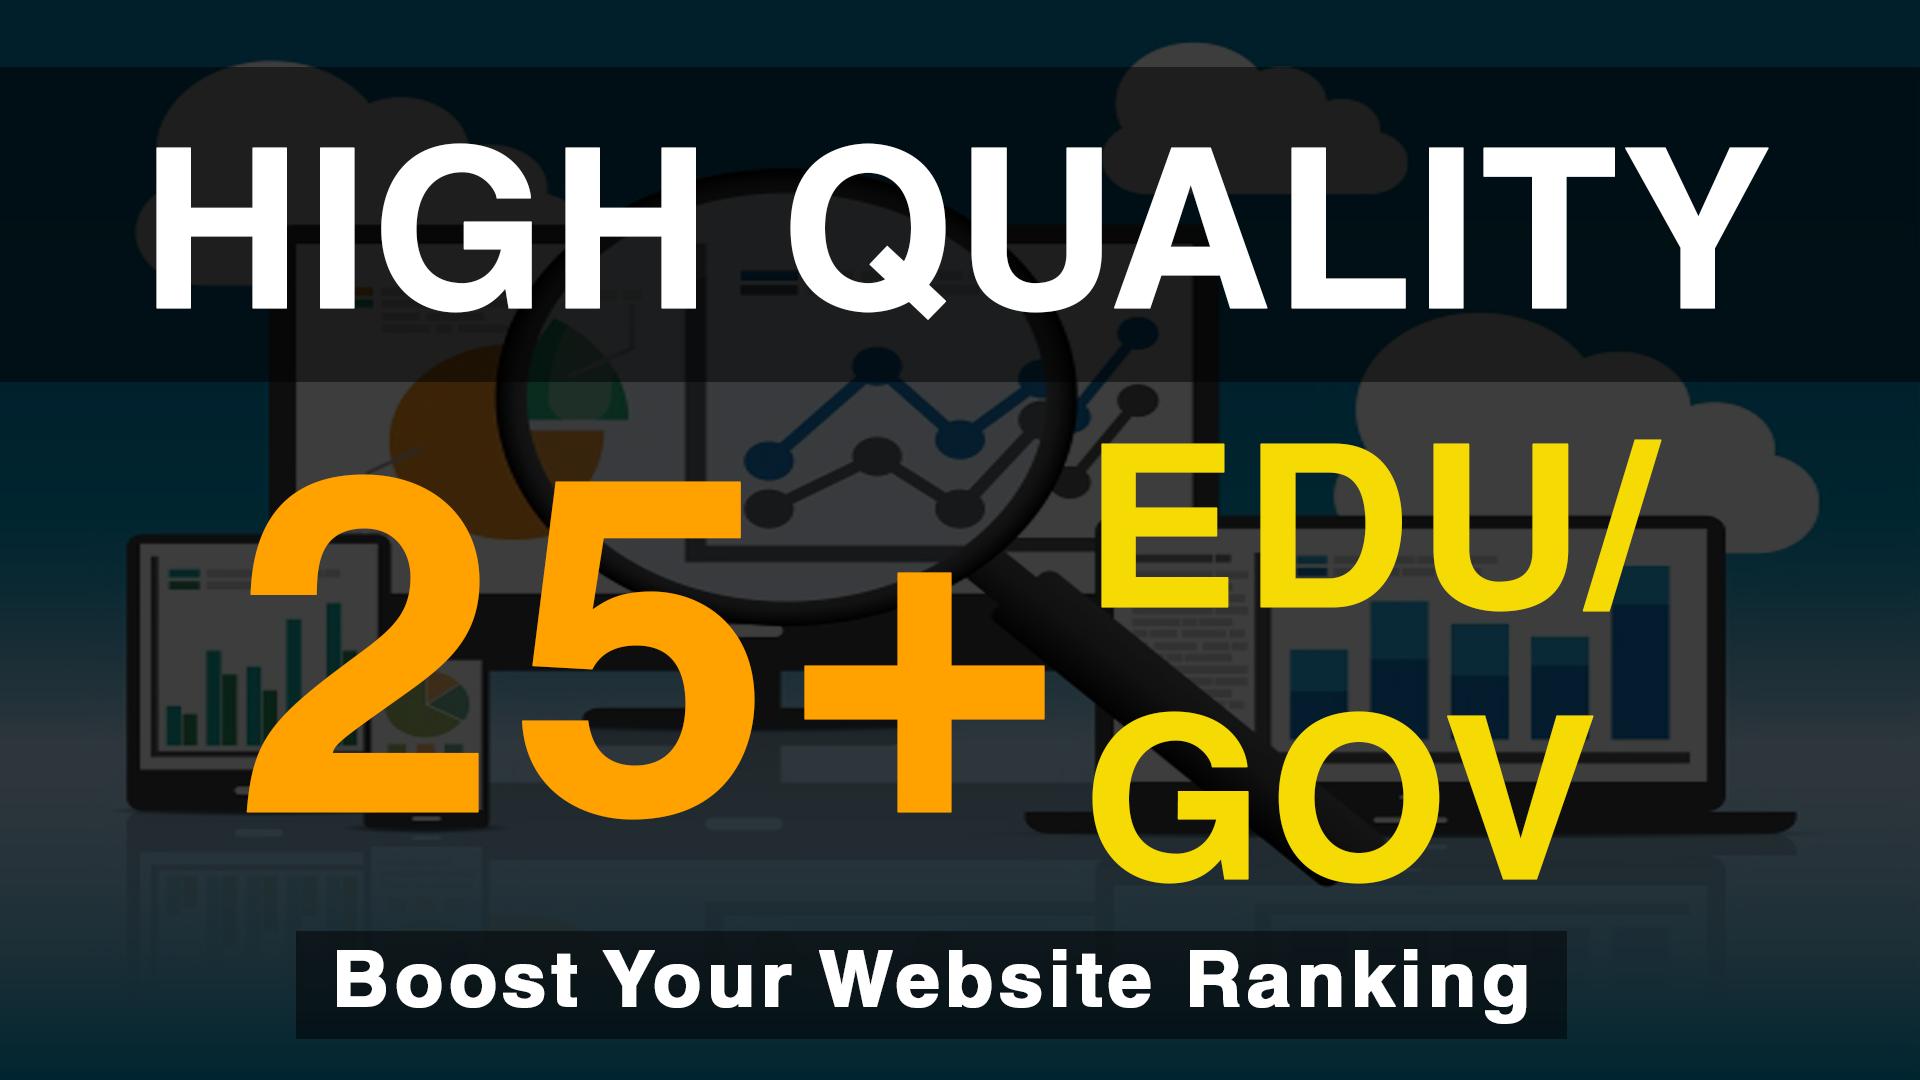 Add 25+ Edu/Gov High Quality Profile Backlinks within a day